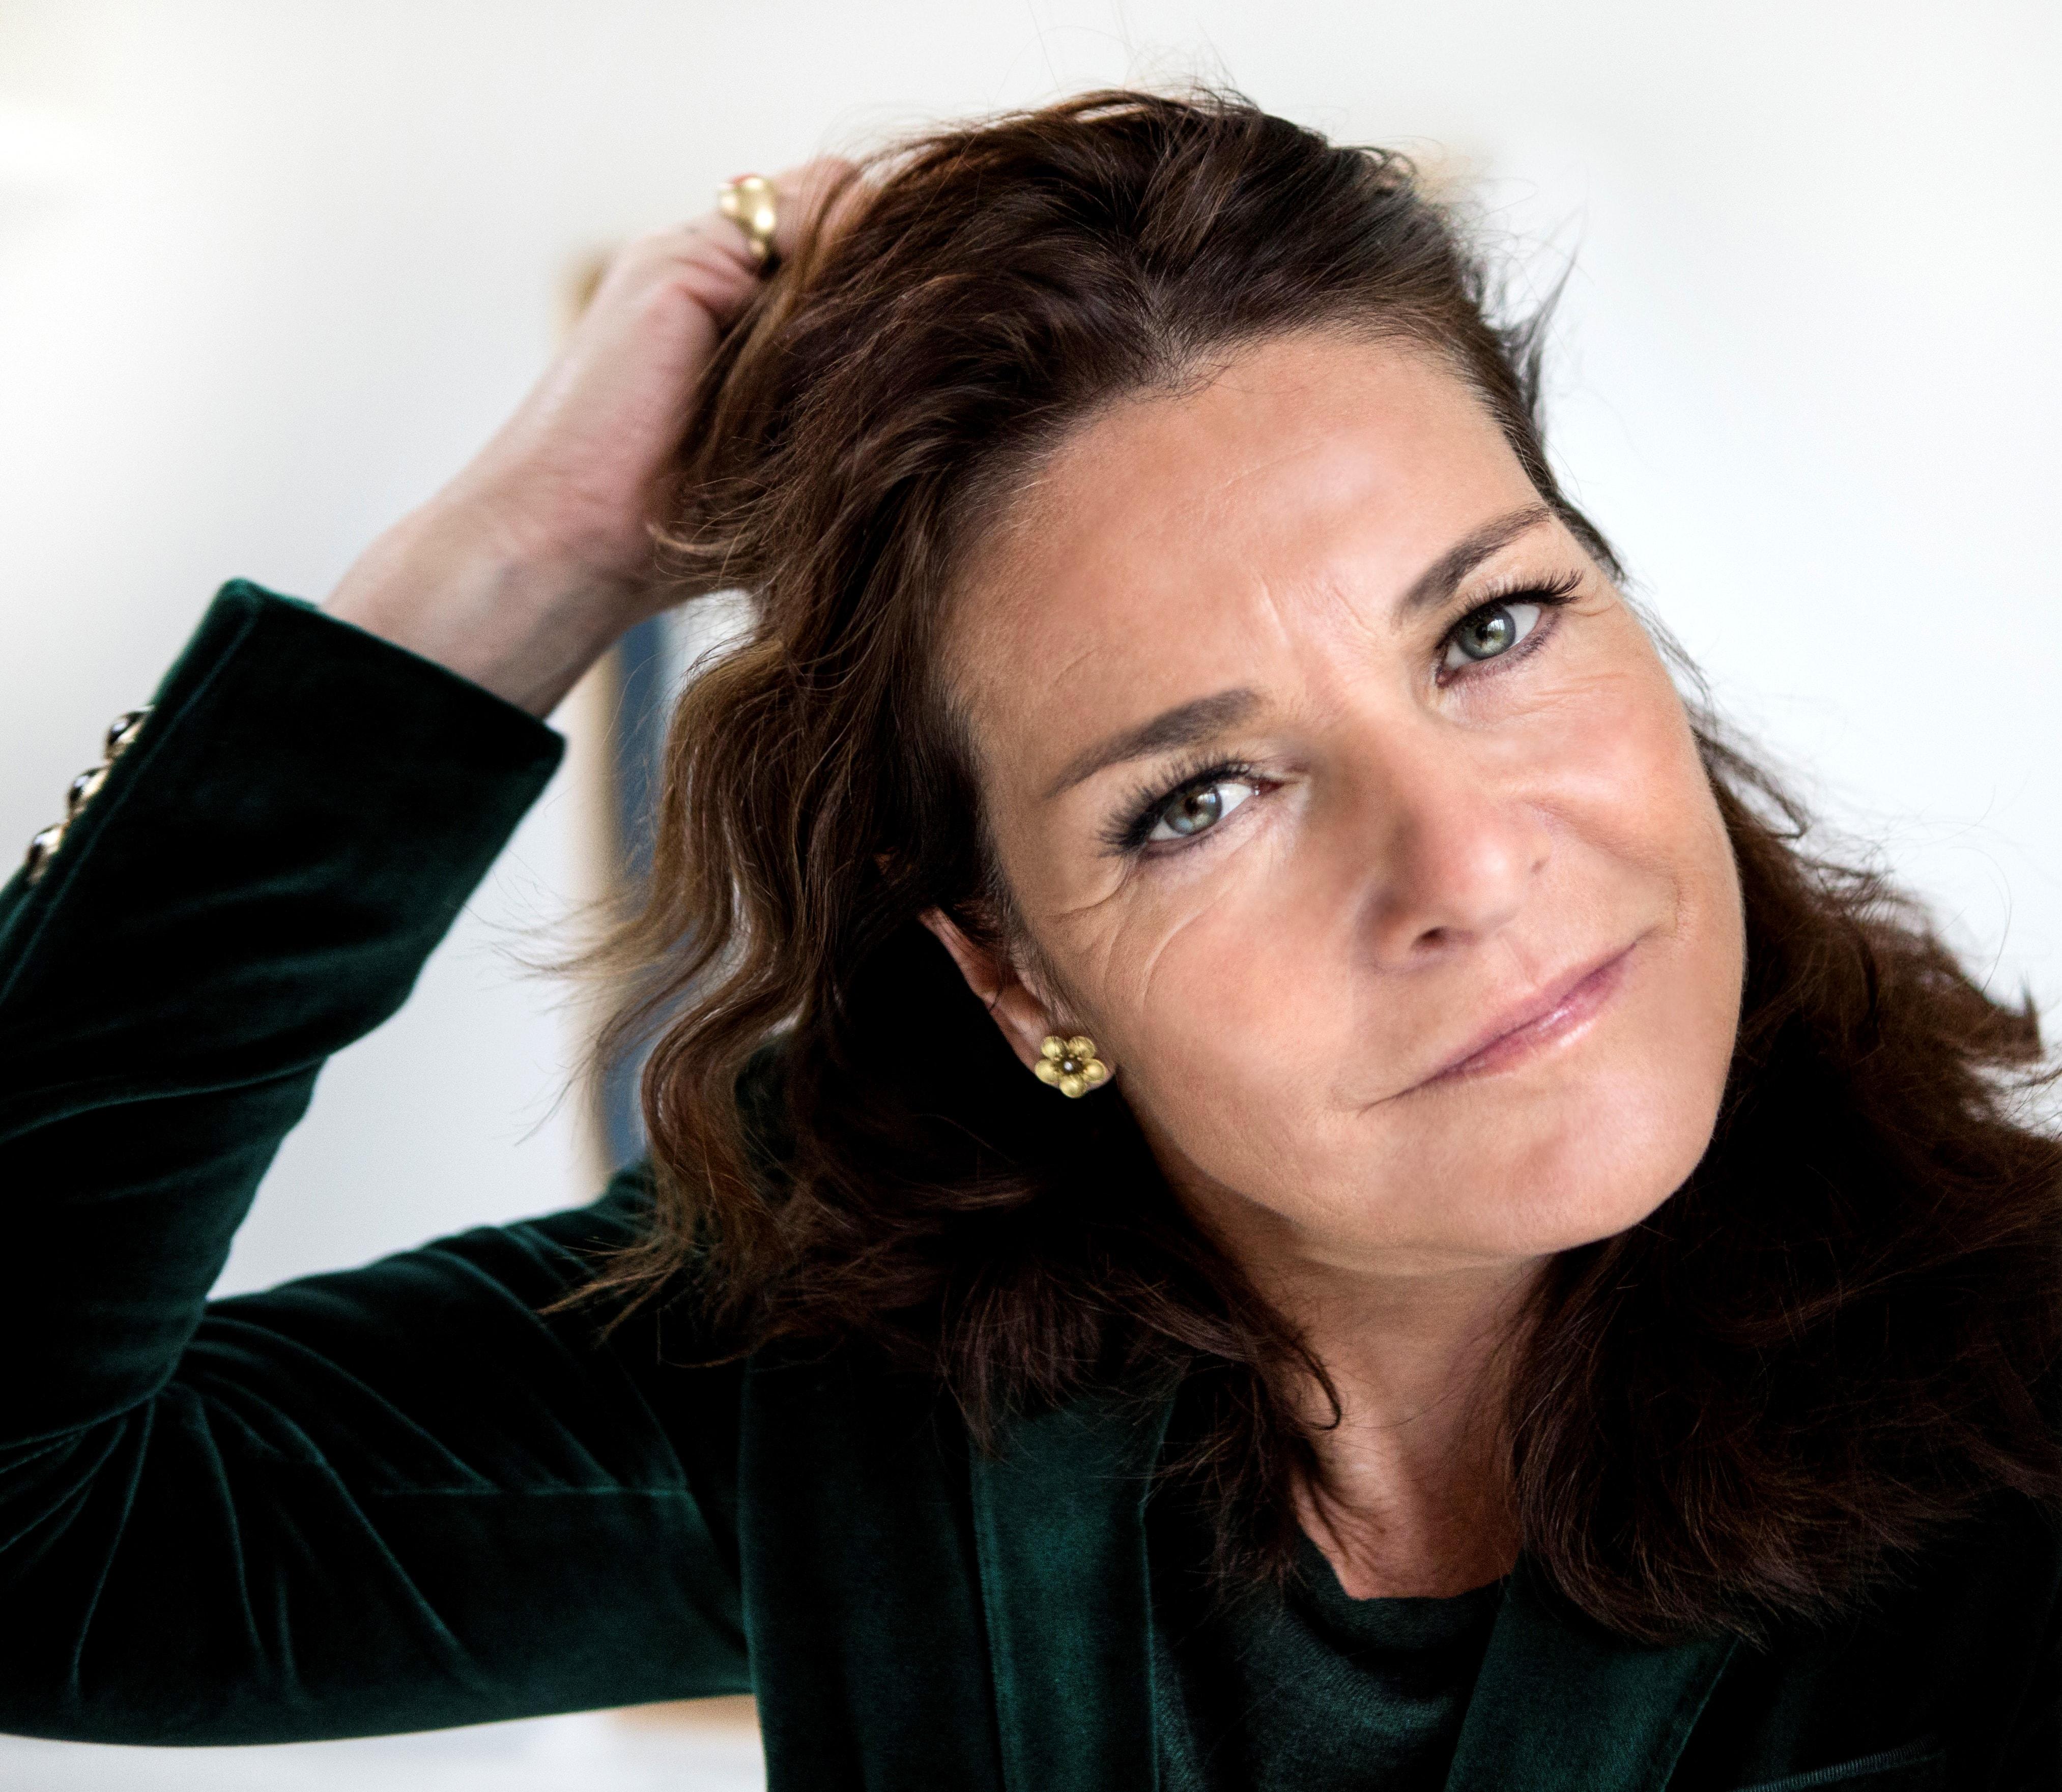 Koncert med Lis Sørensen med band i Kulturcenter Vendsyssel